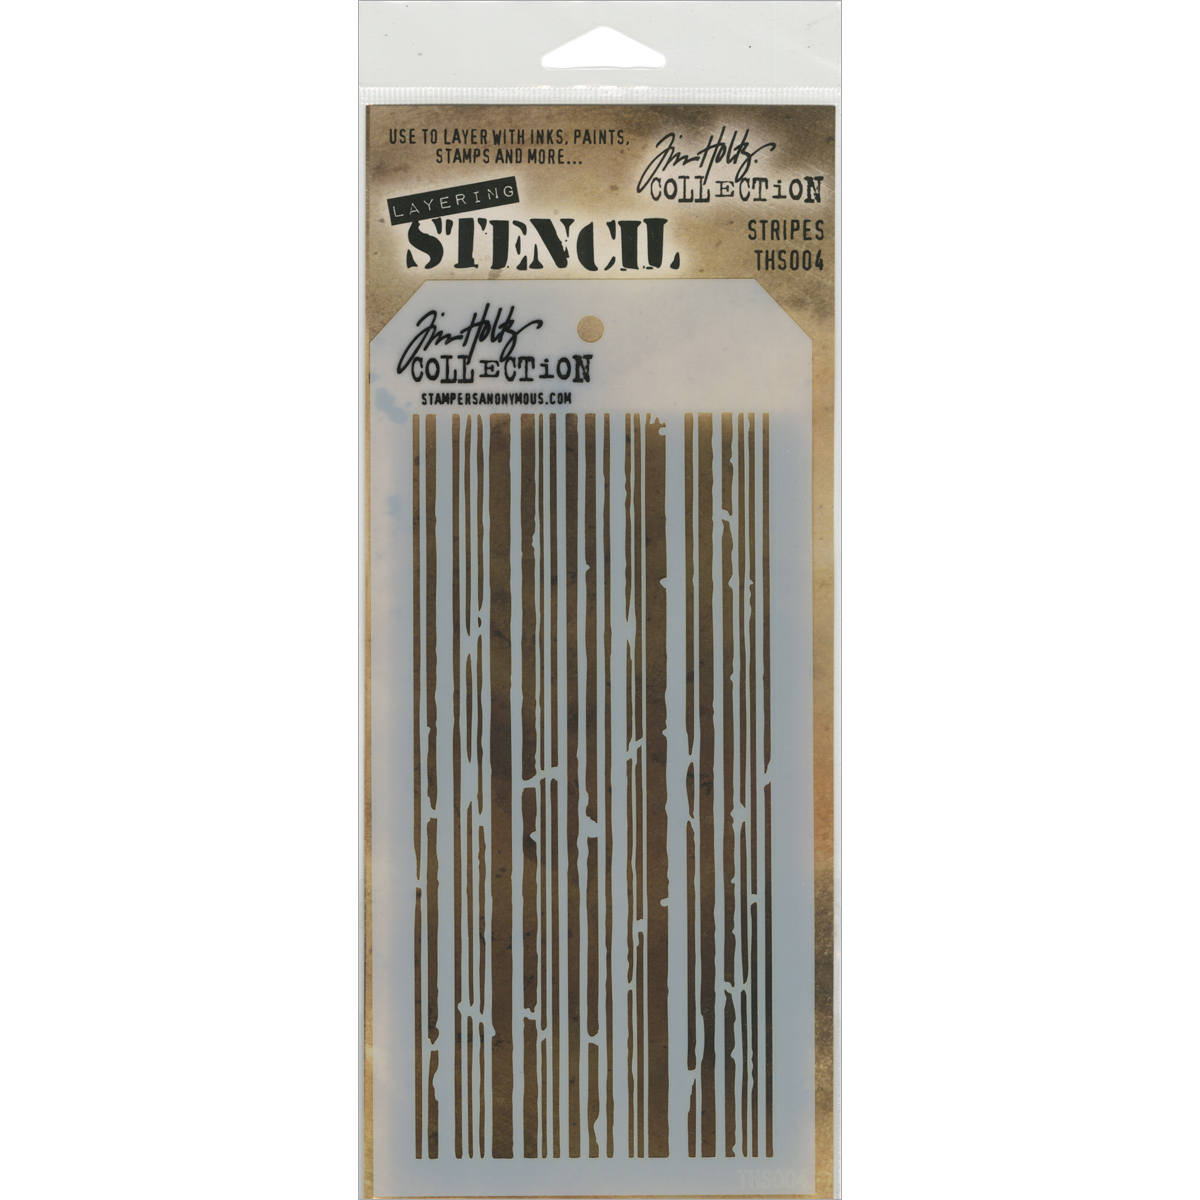 Tim Holtz Layered Stencil 4.125X8.5-Stripes